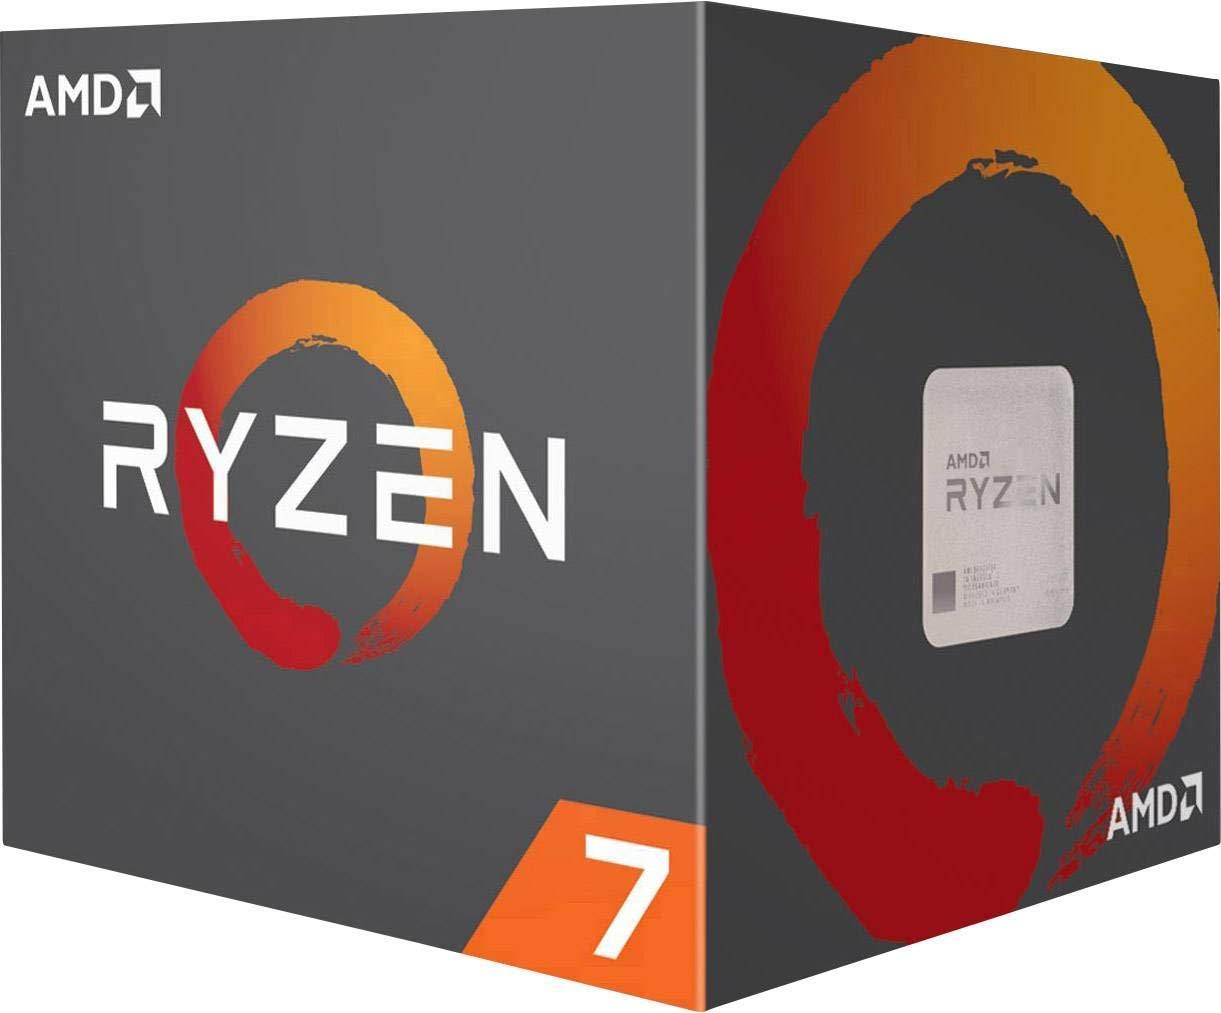 AMD Ryzen 7 3800X Processor (8C/16T, 36MB Cache, 4.5 GHz Max Boost) £299.99 at Amazon